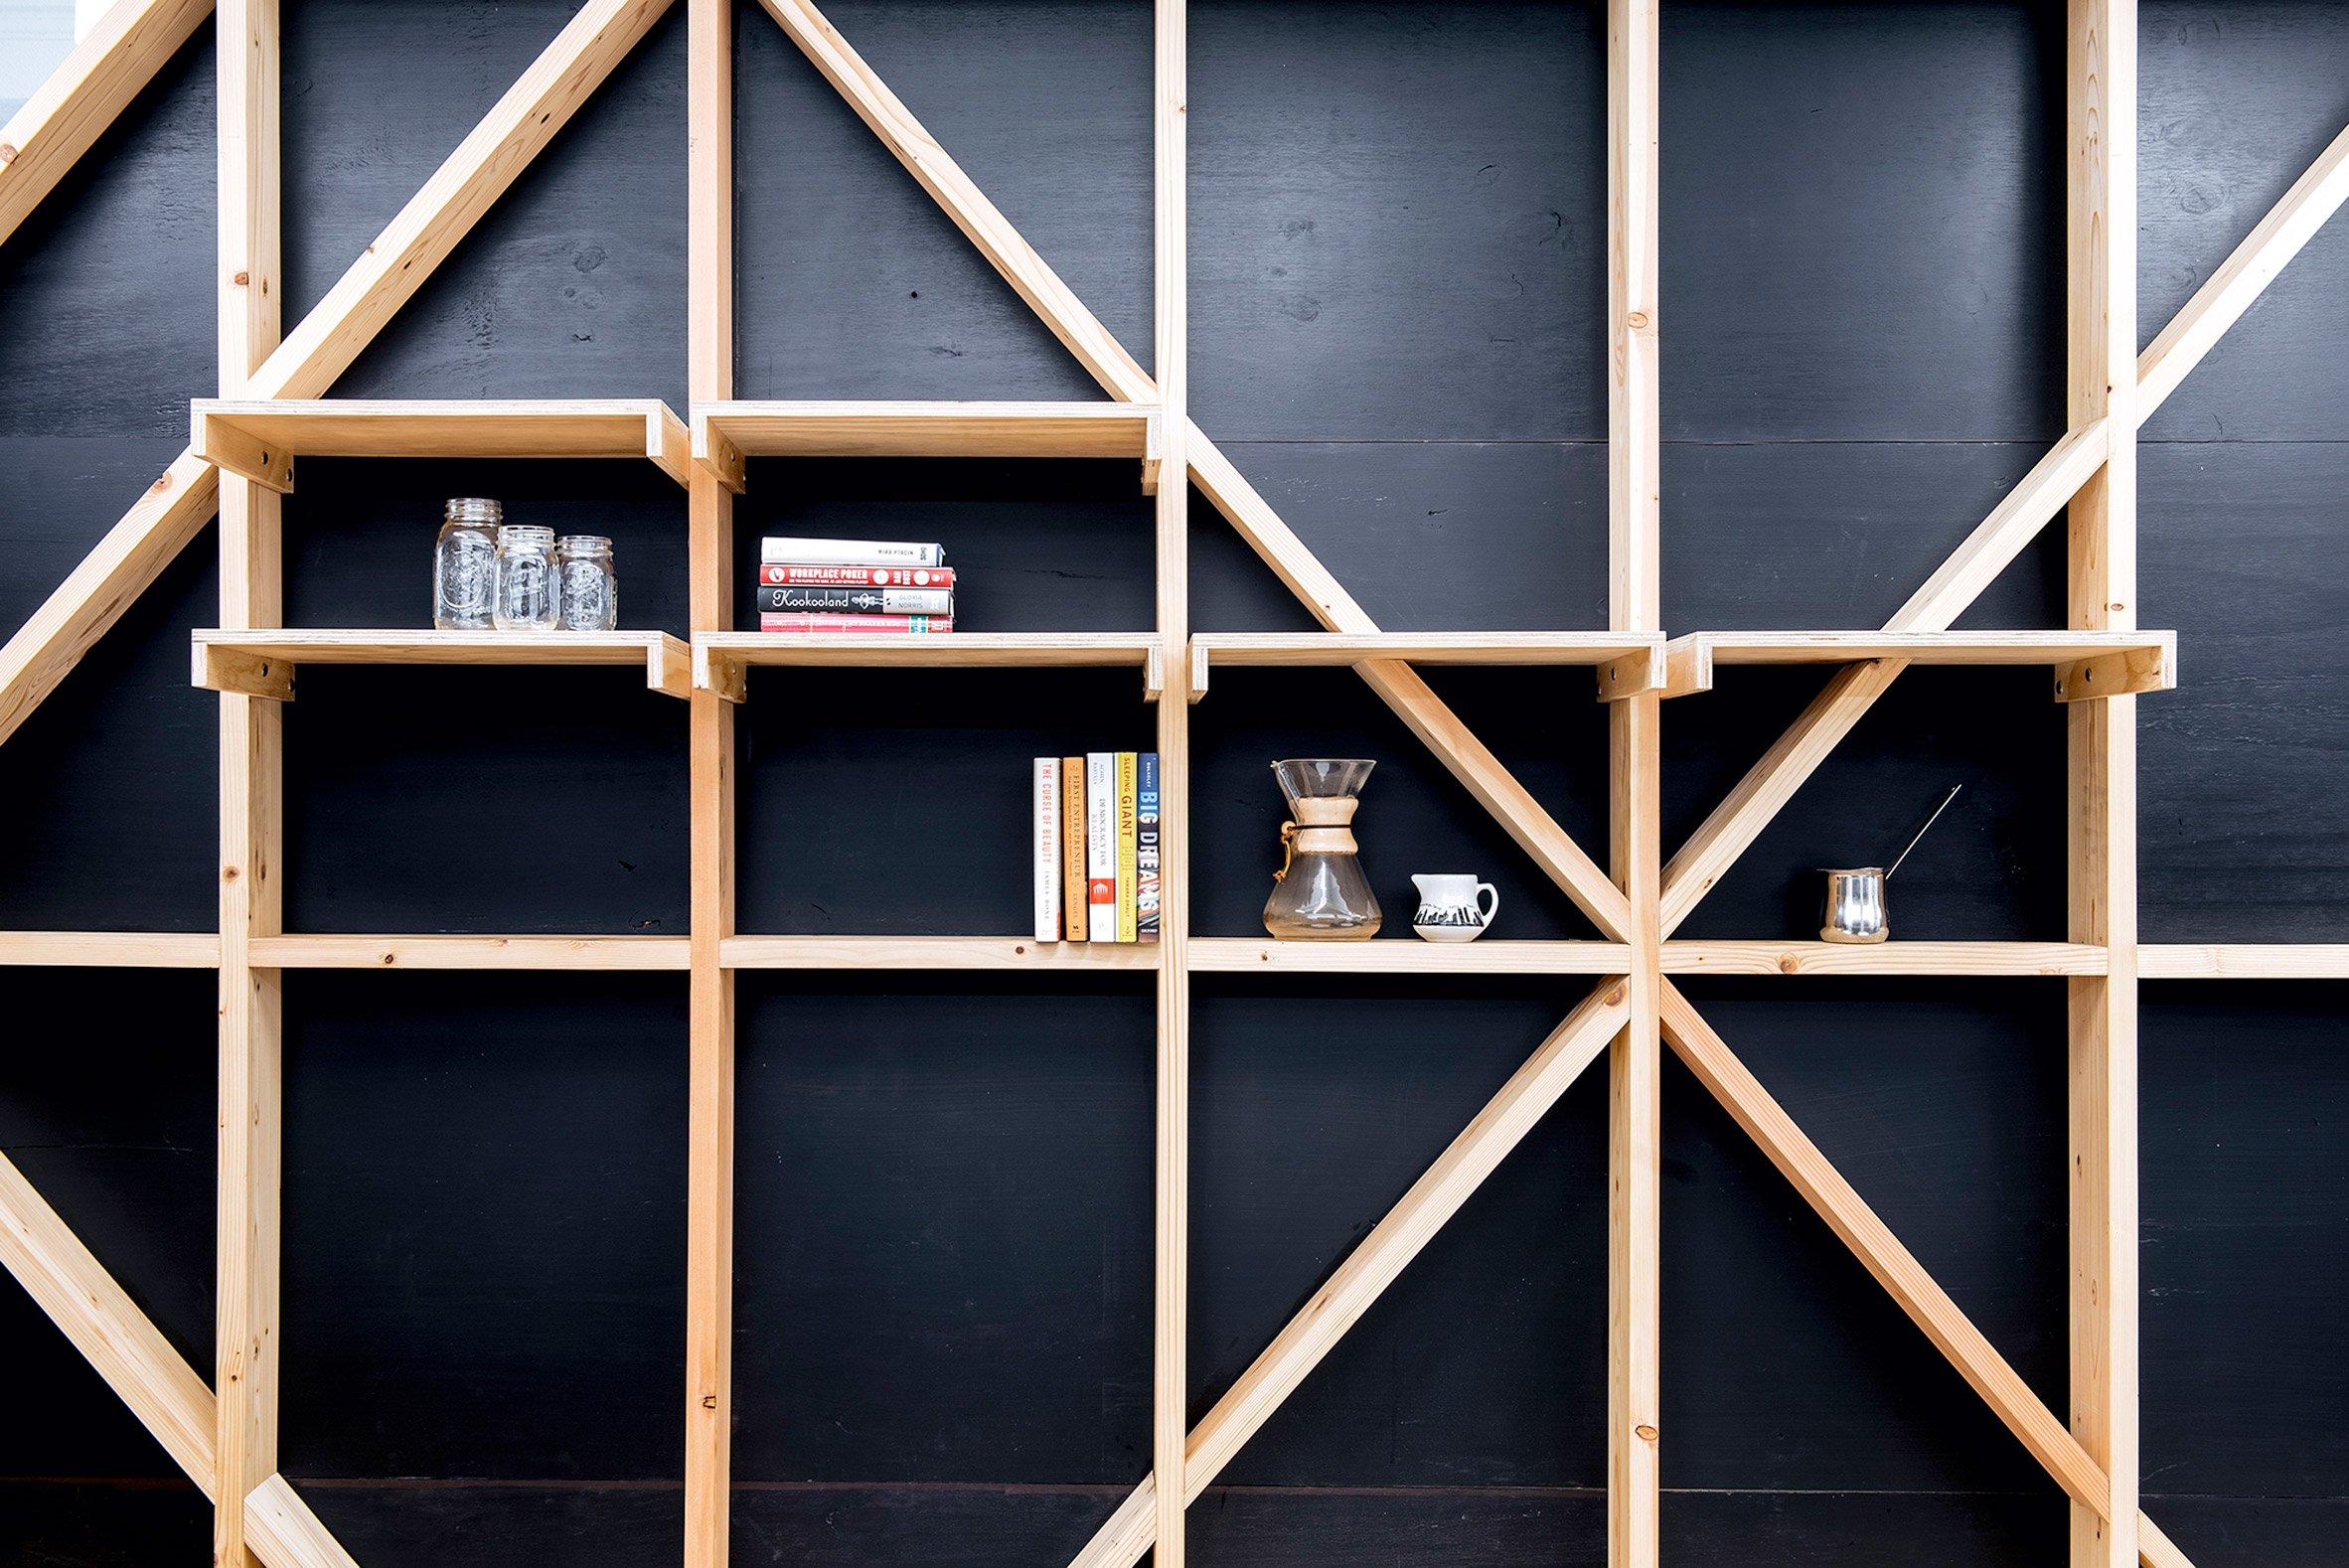 architecture-interiors-offices- manhatten-new-york-design-studia-osnovadesign-osnova-poltava_09